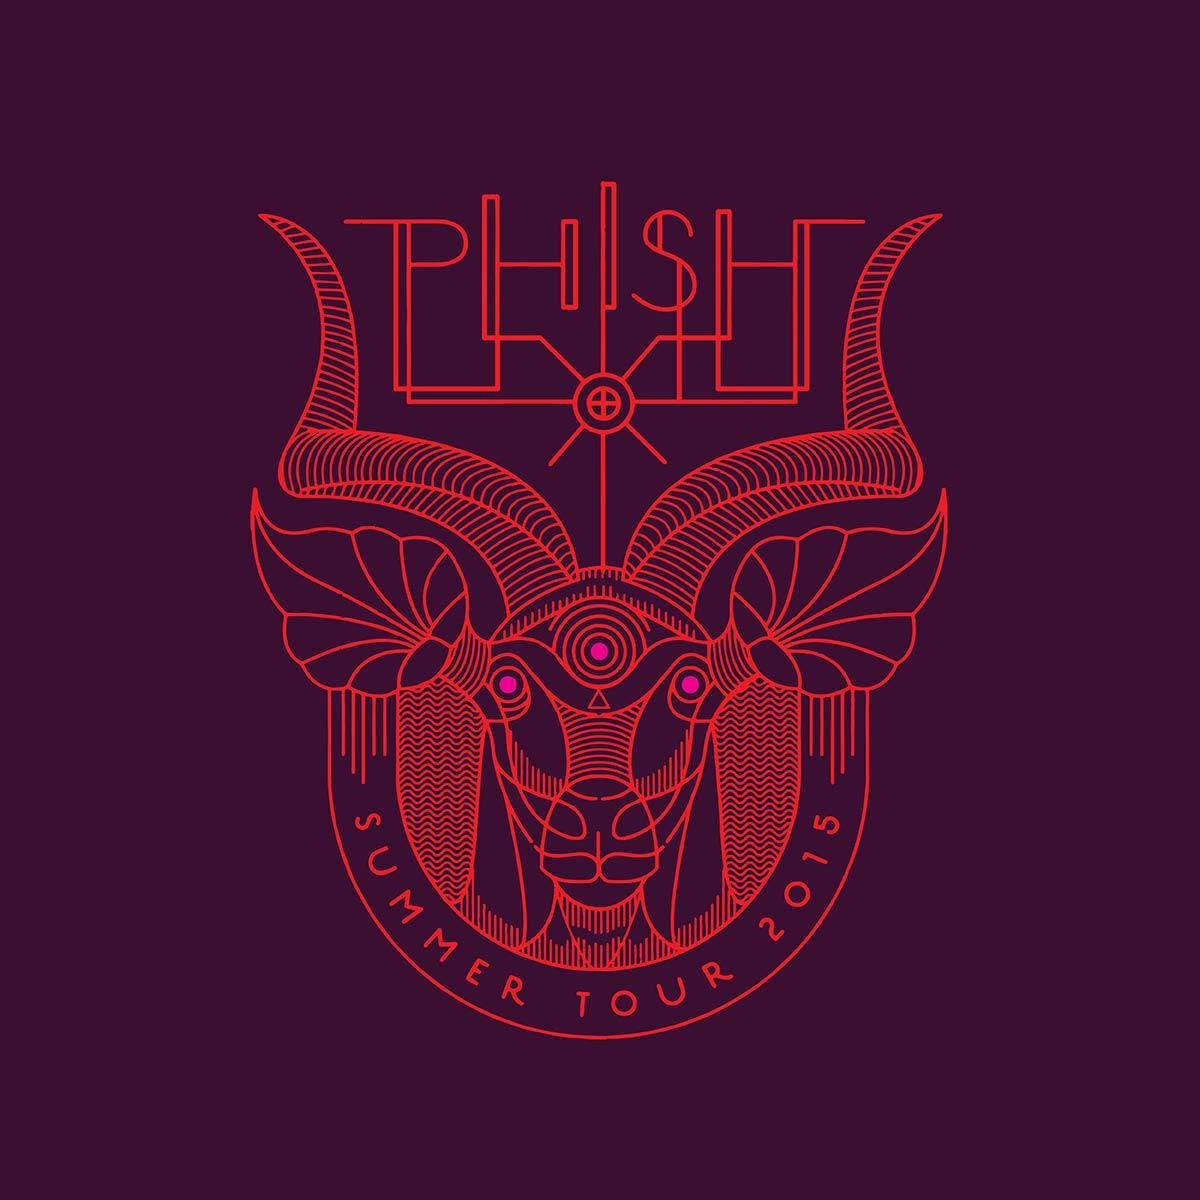 PHISH-STEELY-02.jpg